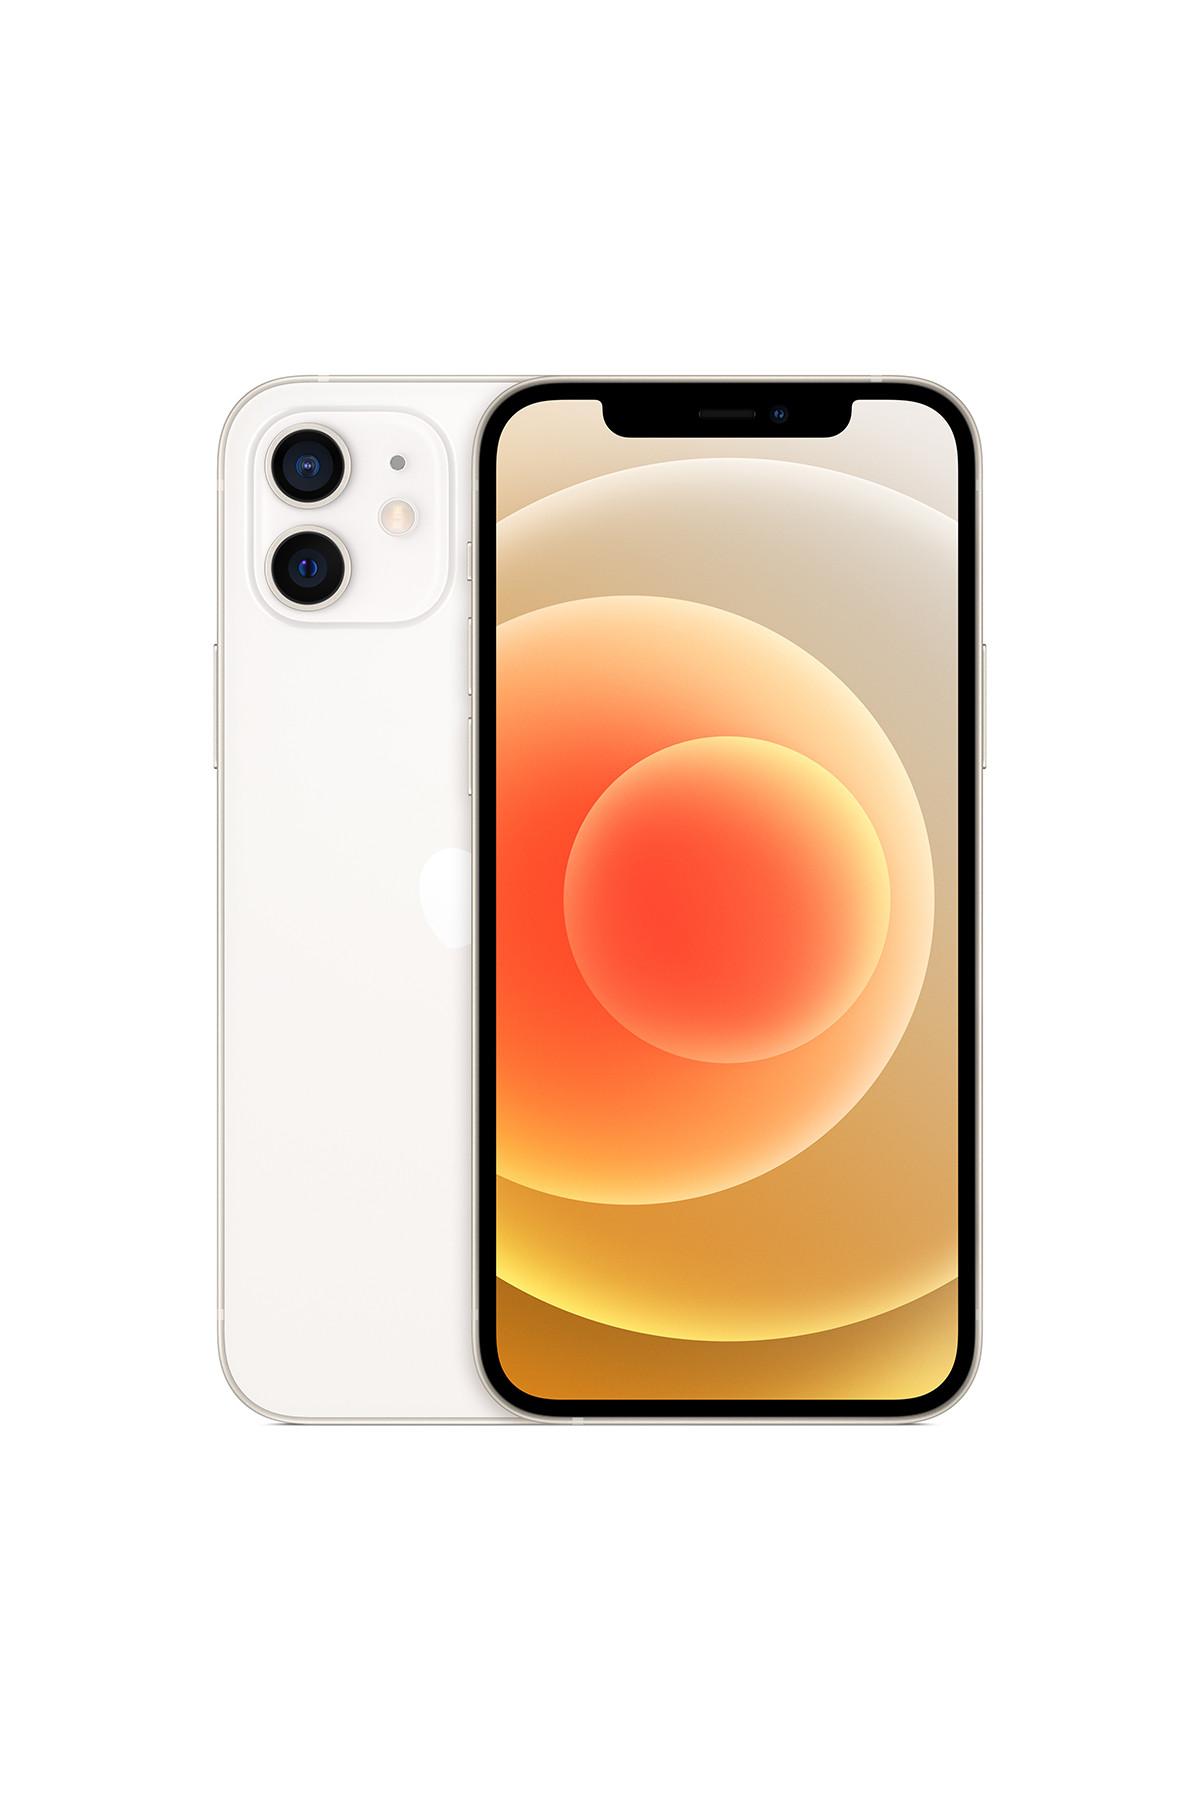 iPhone 12 128GB - White